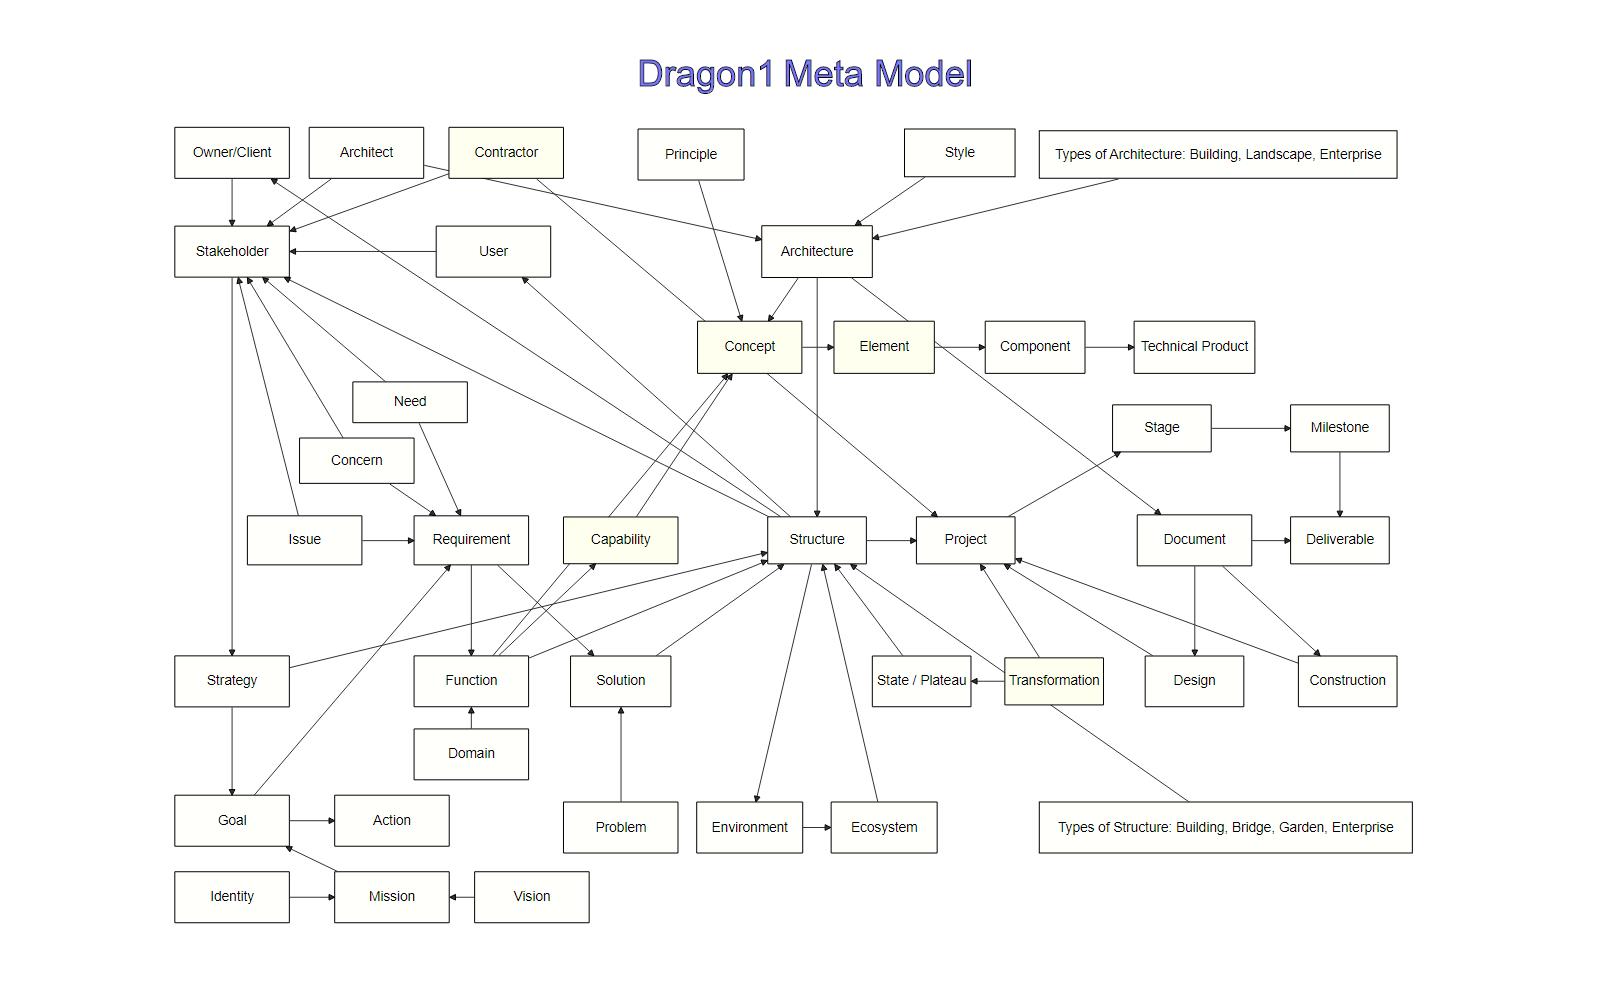 dragon1 meta model